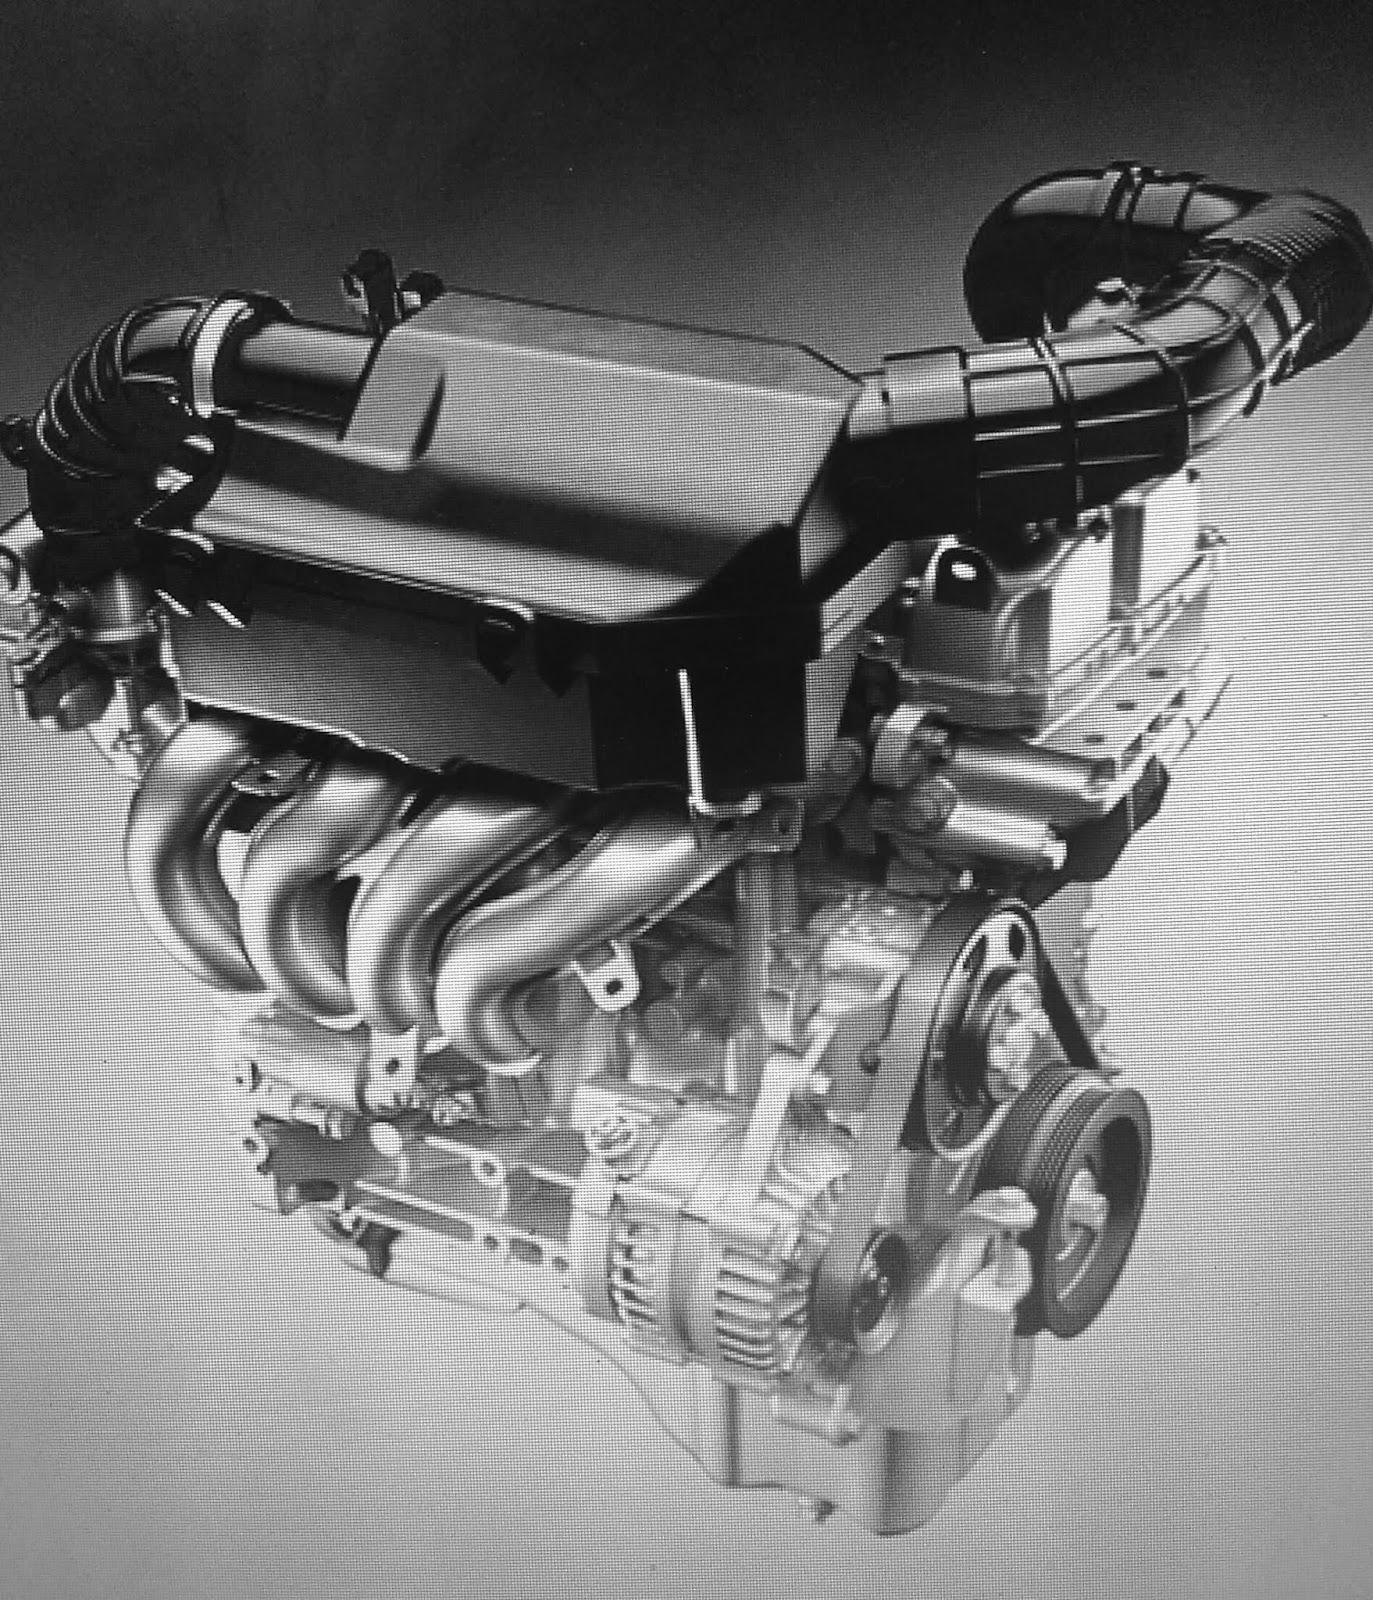 hight resolution of wagonr most selling car in maruti suzuki last 2013 wagonr has k series 998cc three cylinder engine this car has bsvi engine this car have 20 22kmpl